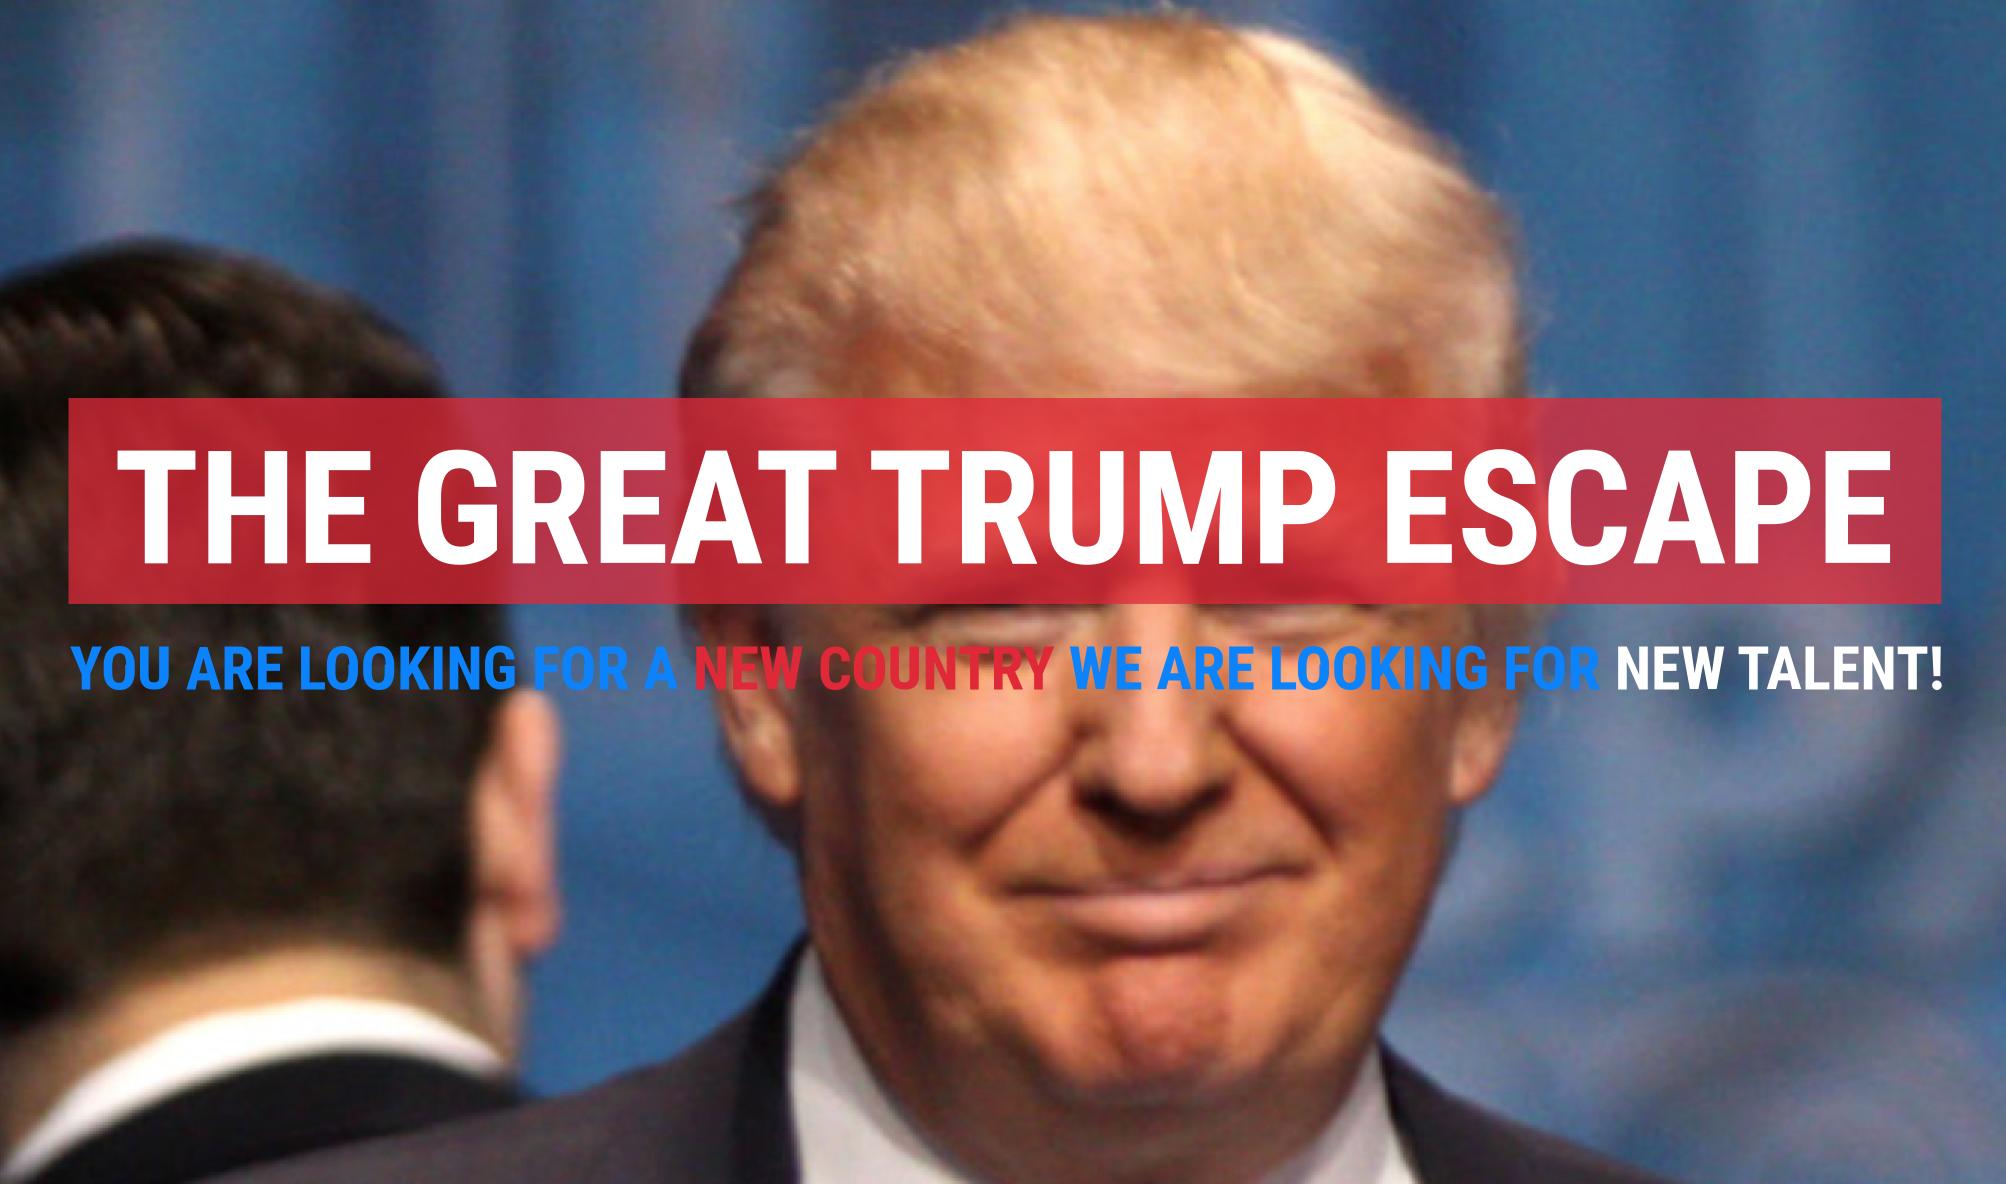 great-trump-escape-round-round-ad-agency